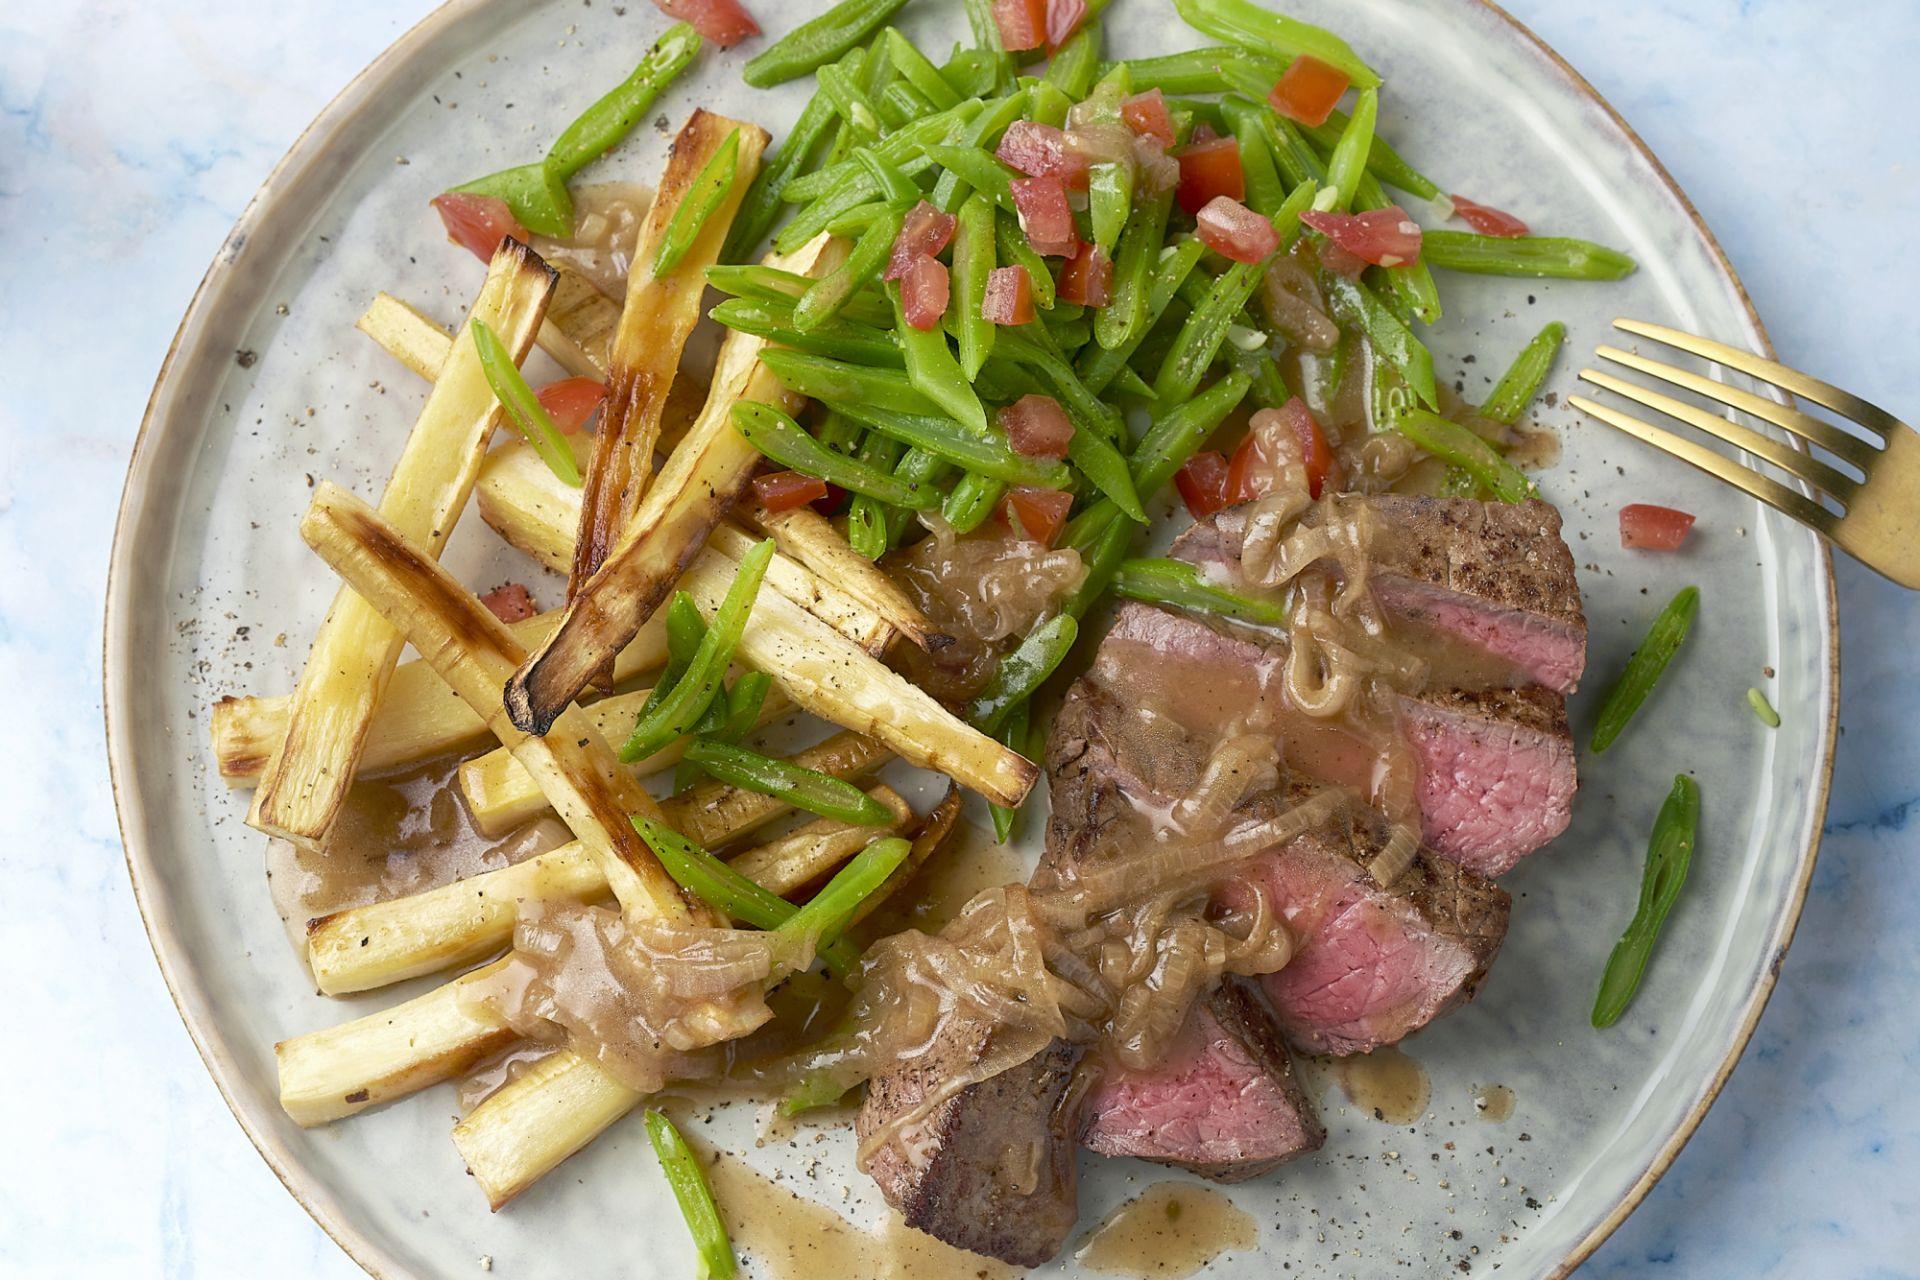 Steak met snijbonen, sjalottensaus en pastinaakfrietjes